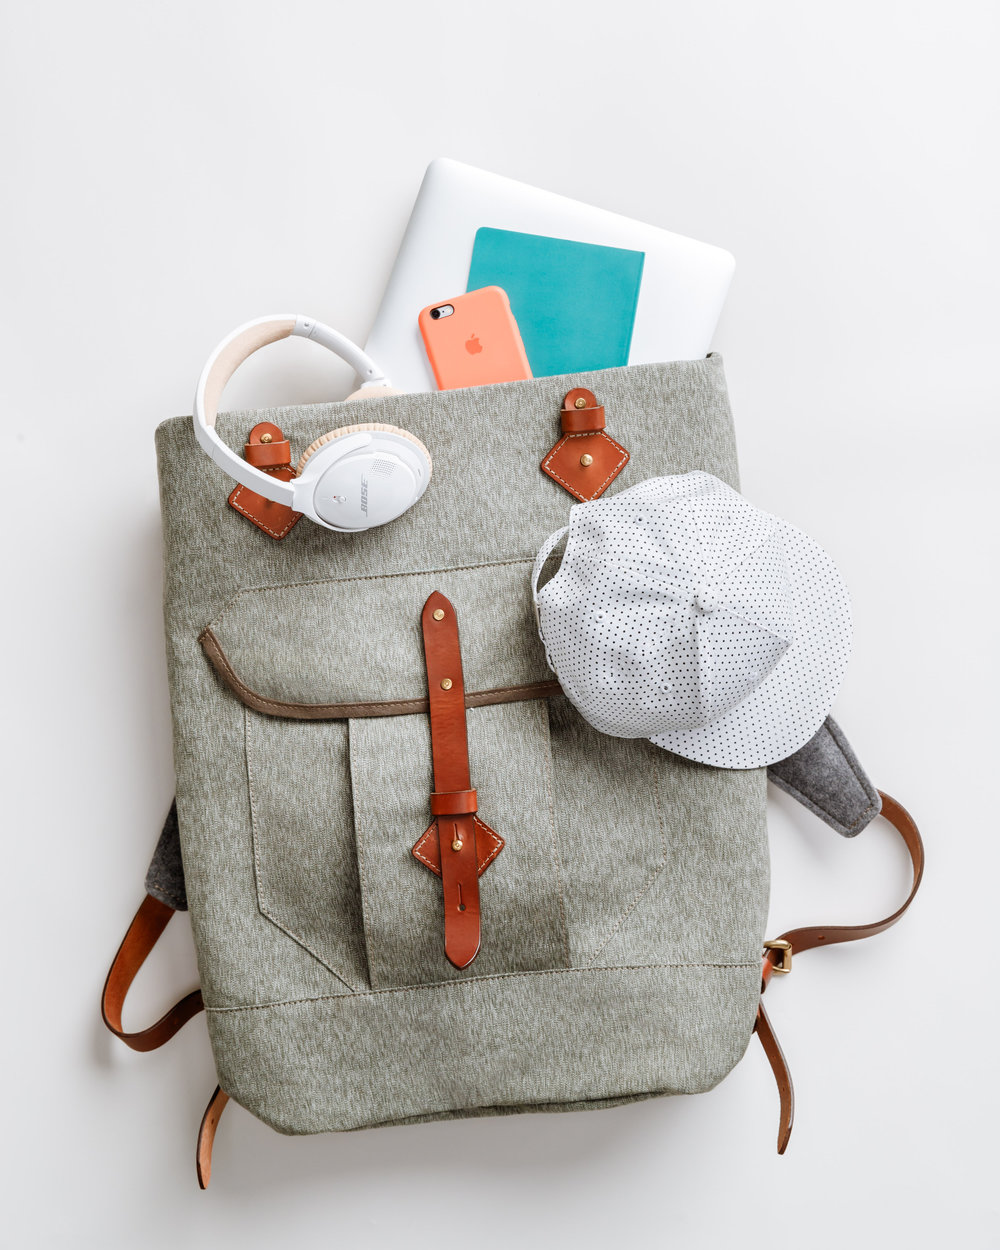 092916_MO_Ebay_Backpack_Large_M_0006-V02.jpg